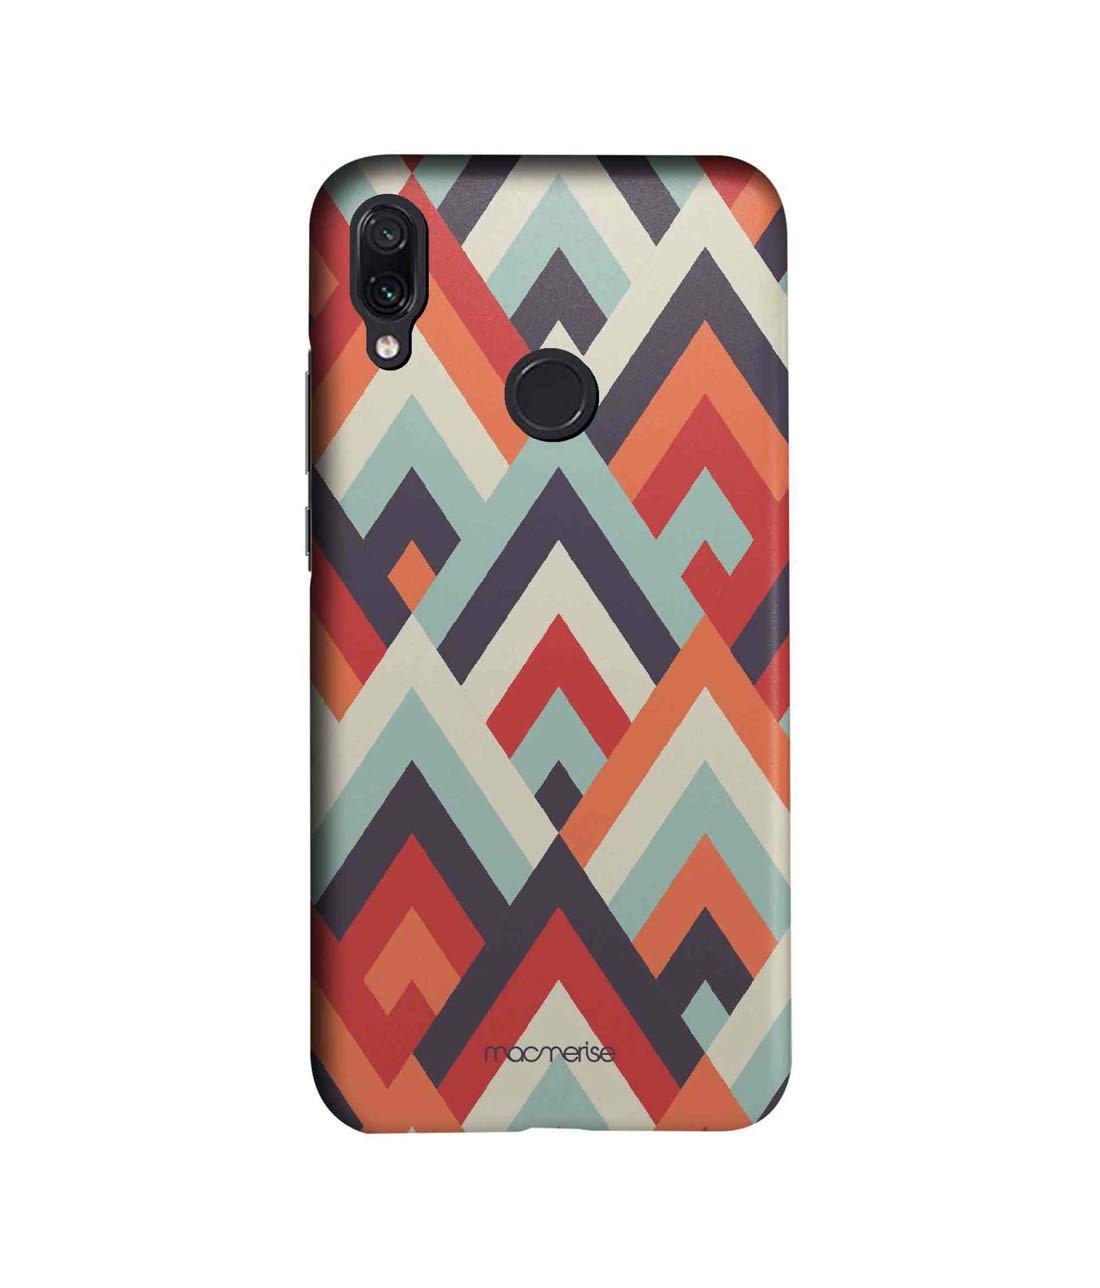 Symmetric Cheveron - Sleek Phone Case for Xiaomi Redmi Note 7